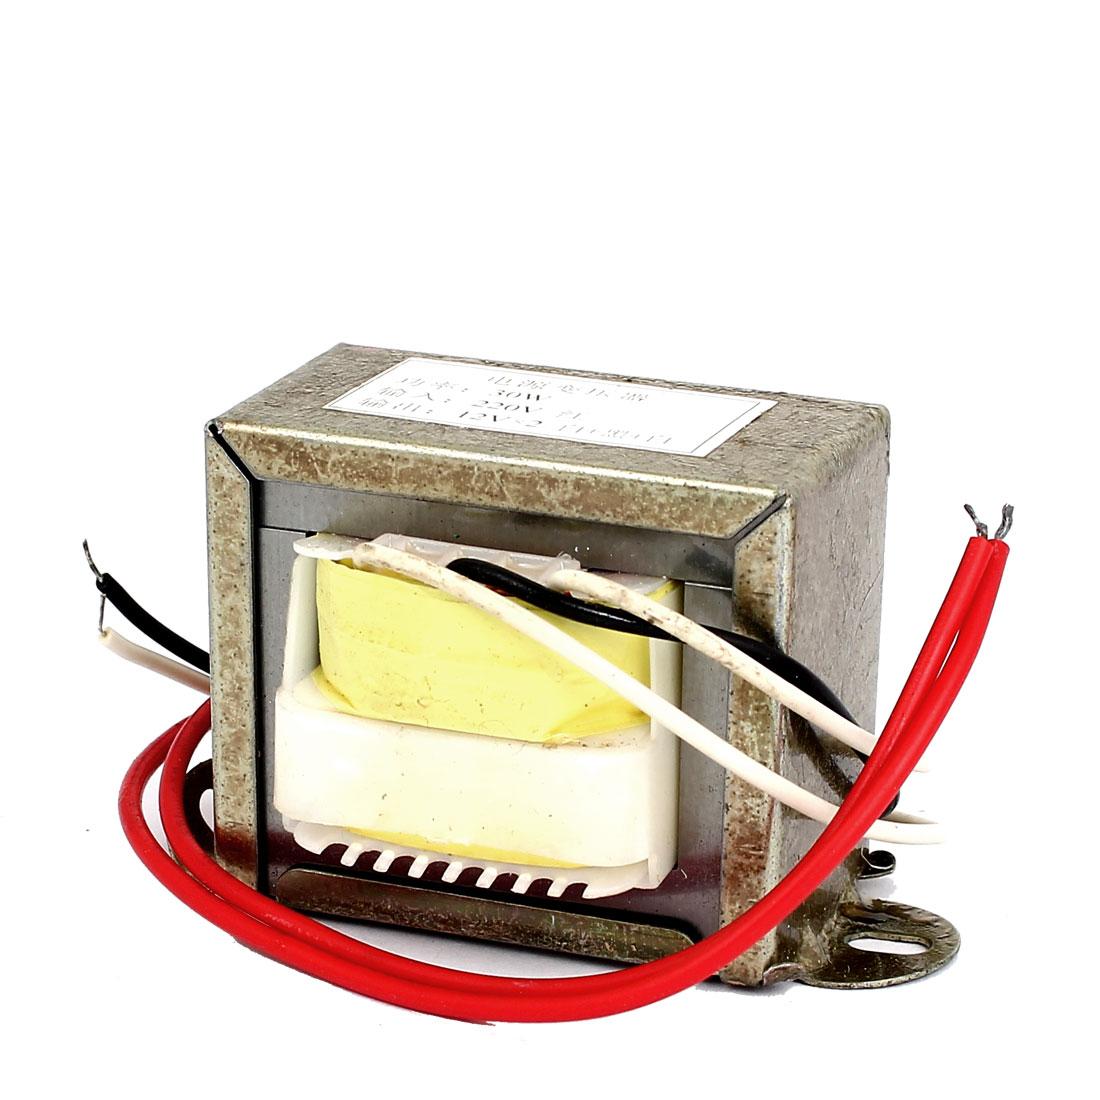 220V Input 12V 30W Output Vertical Mount EI Core Power Transformer